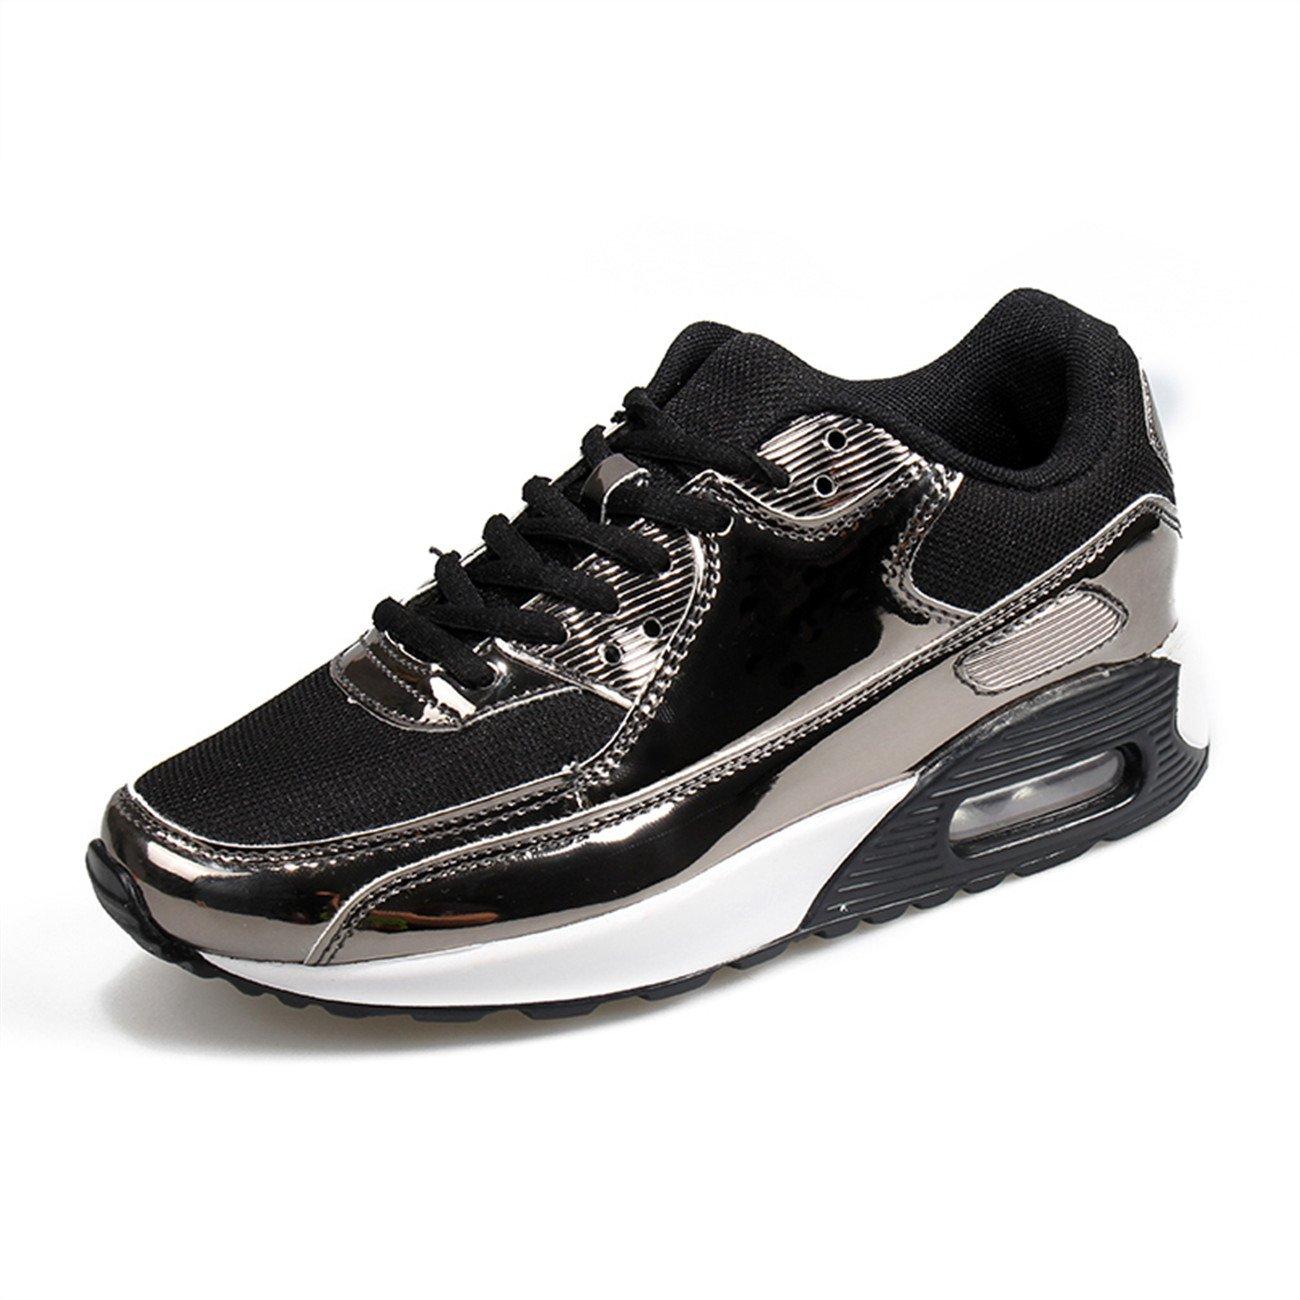 XINGLAN Men Women Unisex Couple Casual Running Sneakers Breathable Athletic Air Cushion Sports Shoes B073QVD89G Women 10 B(M) US / Men 8.5 D(M) US|Black